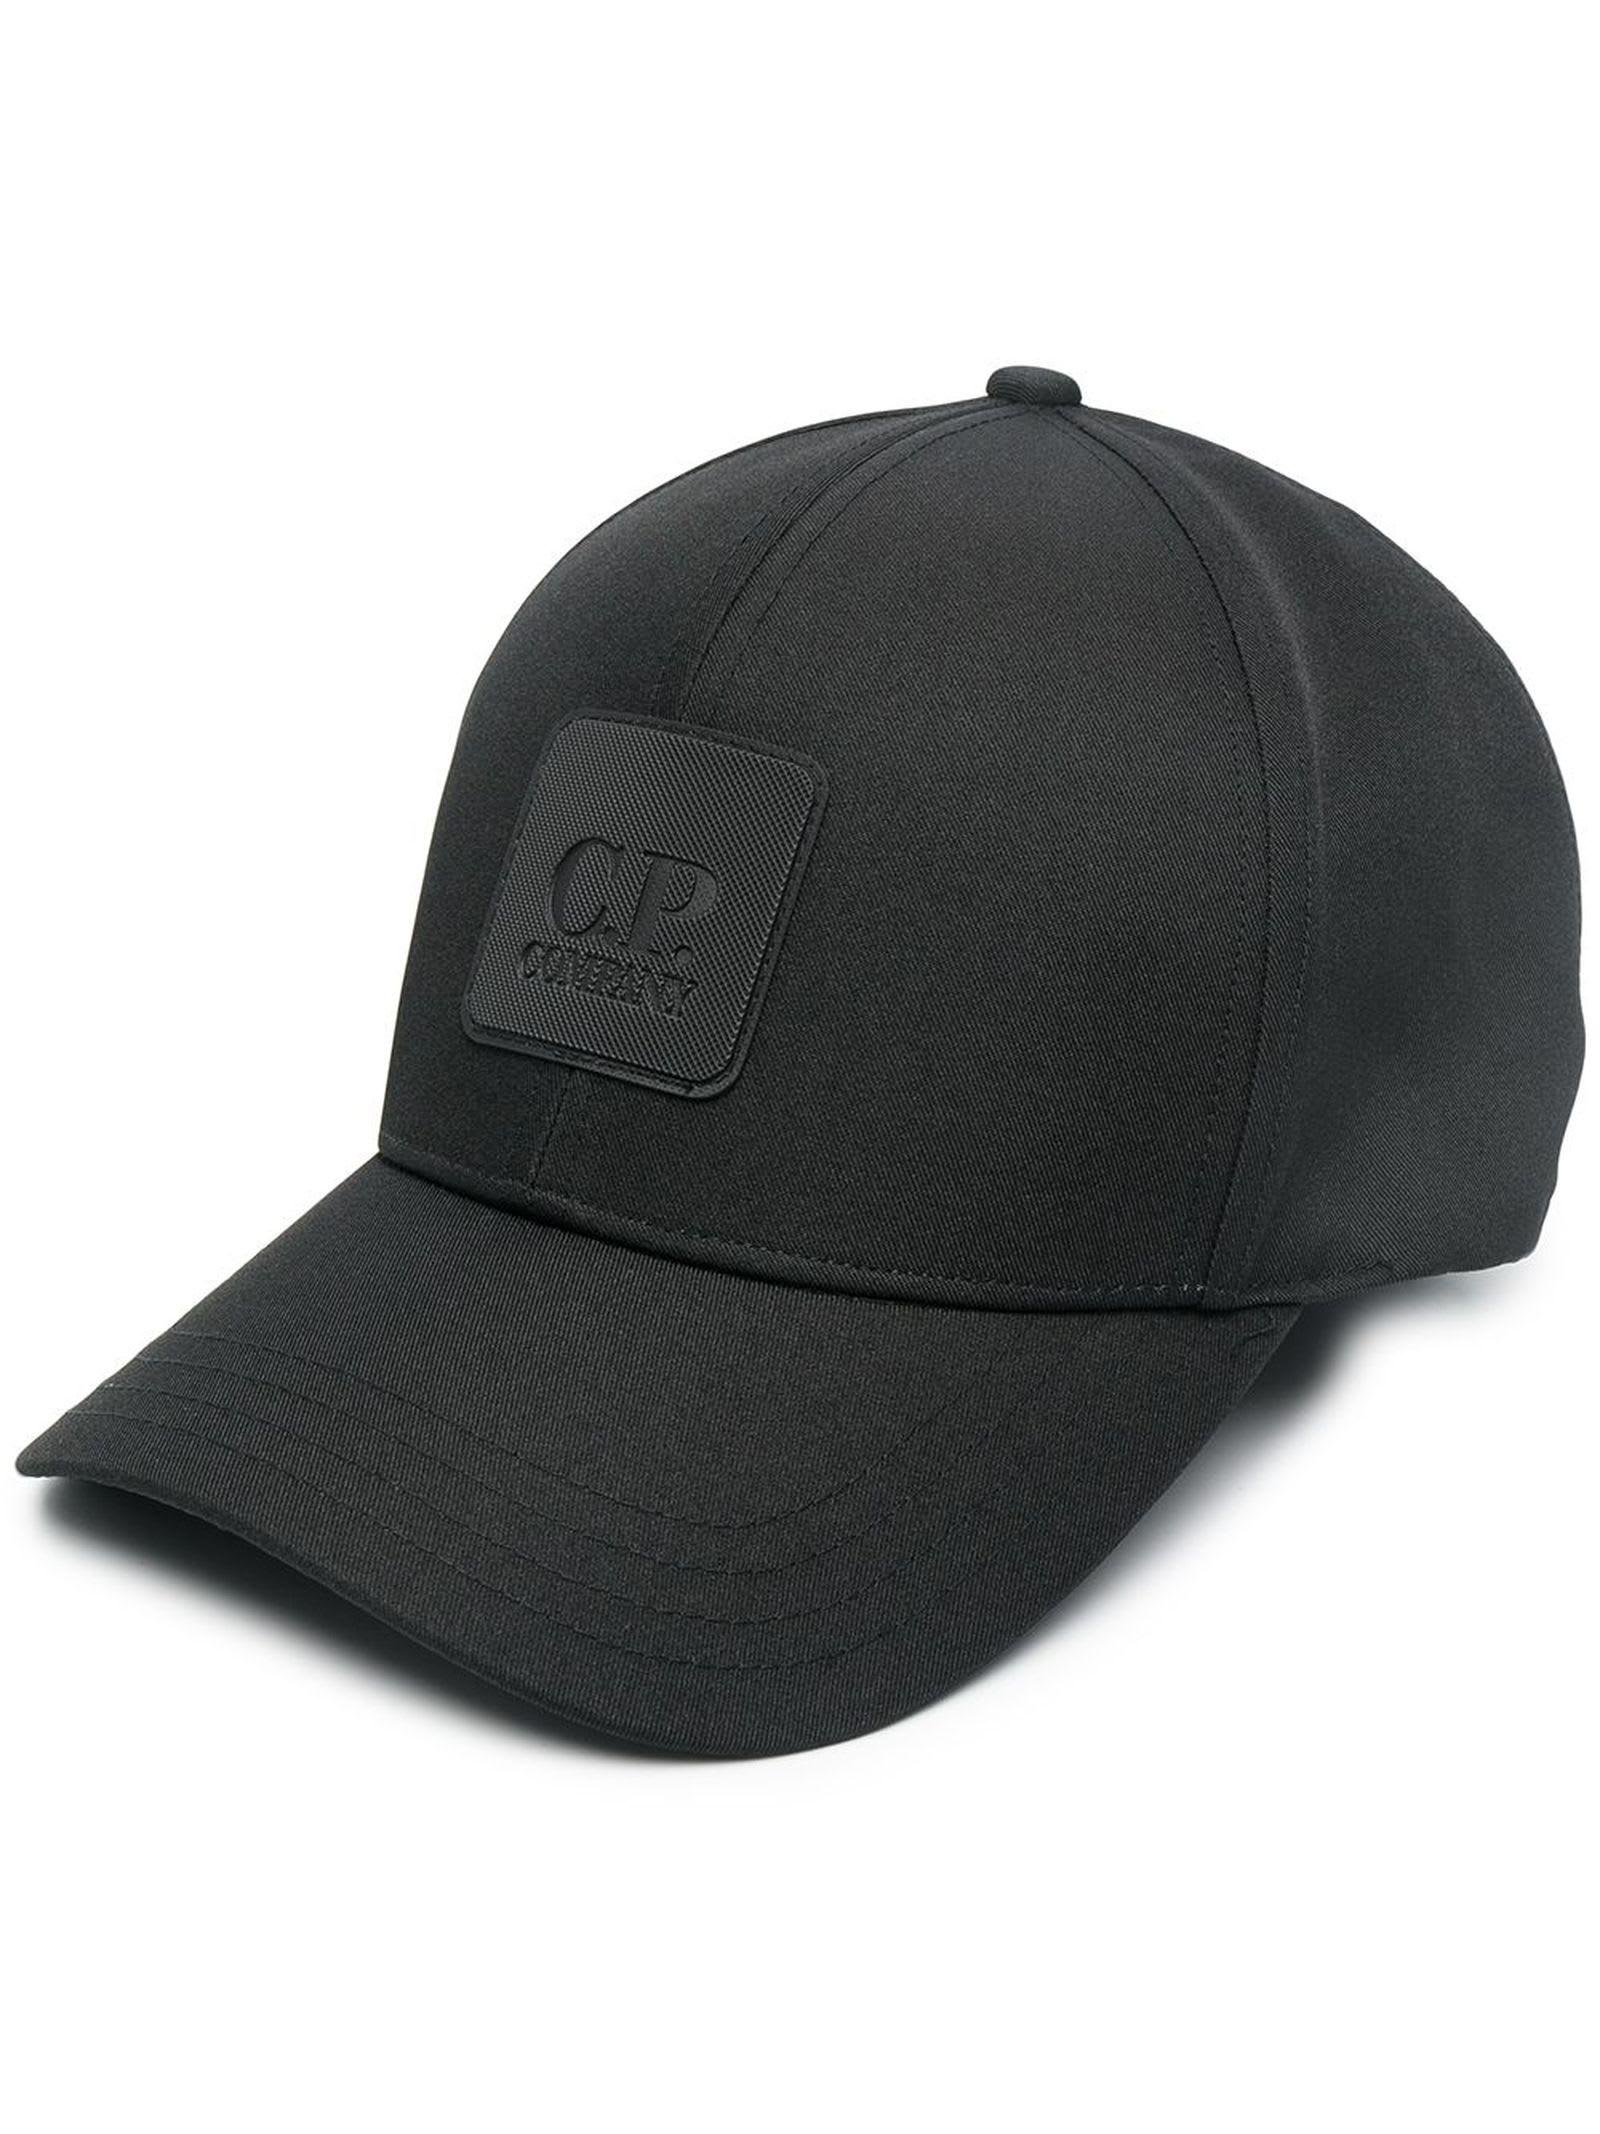 C.p. Company Caps METROPOLIS SERIES LOGO BADGE CAP